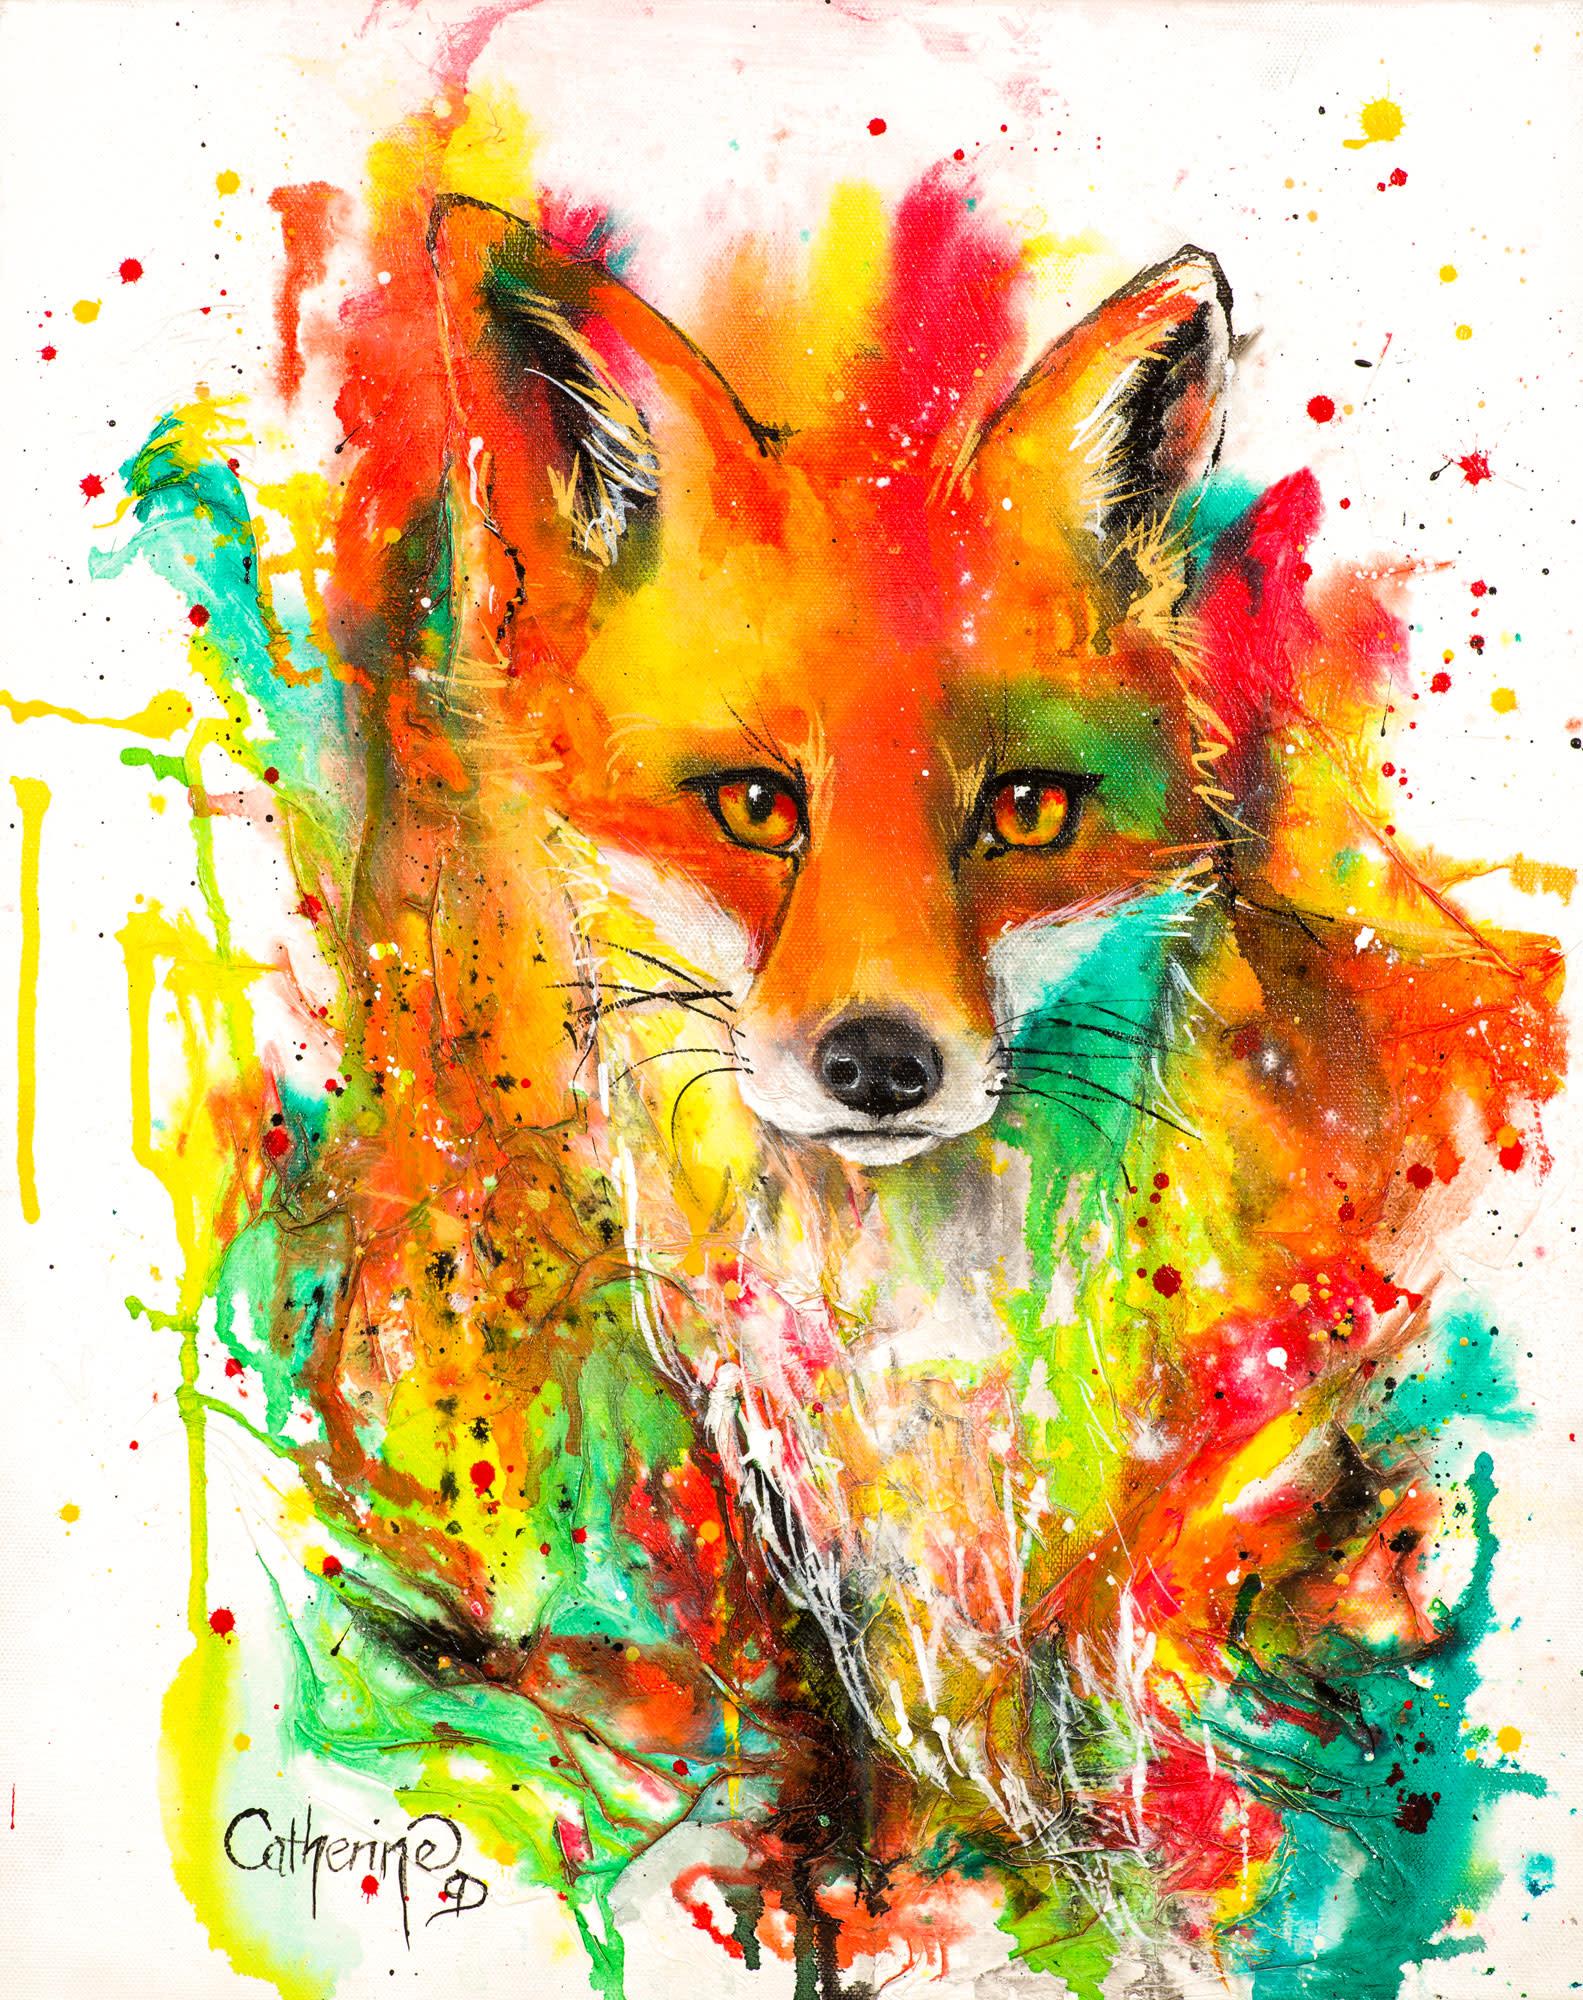 C clark dowden 014 fox 1 hno8yc